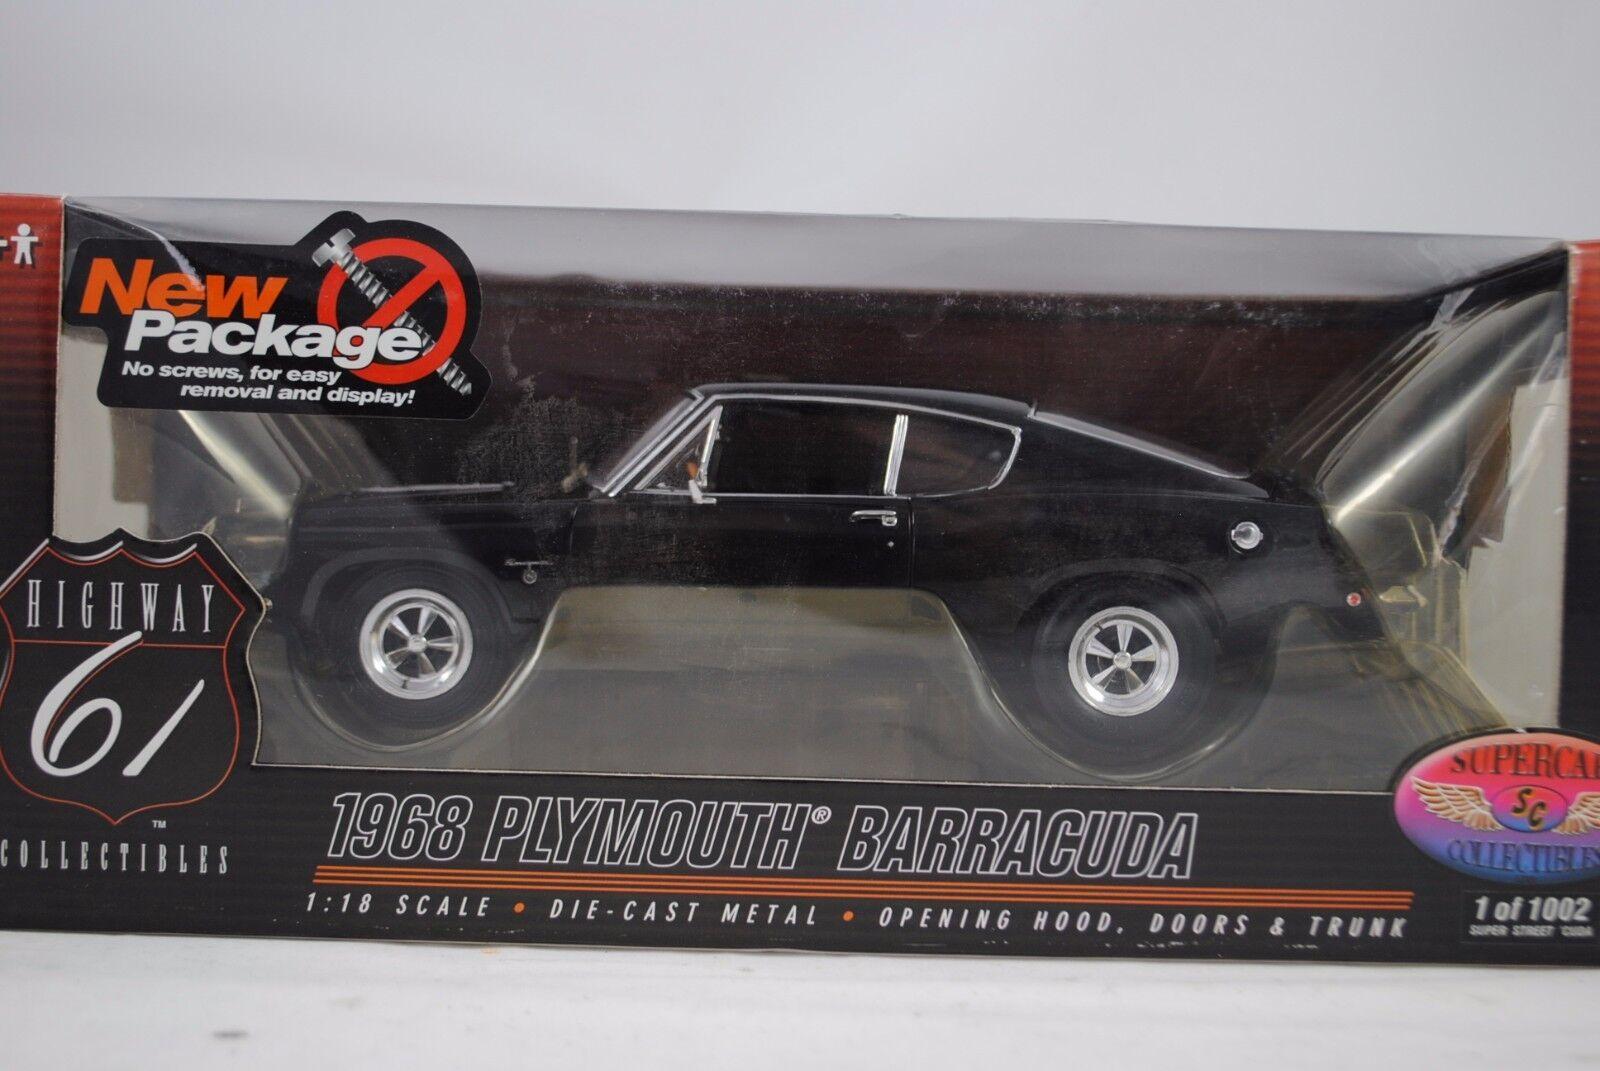 1:18 Highway 61 Supercar Coll. 1968 Plymouth Barracuda Nero Lmtd.1/1002 Rarneu